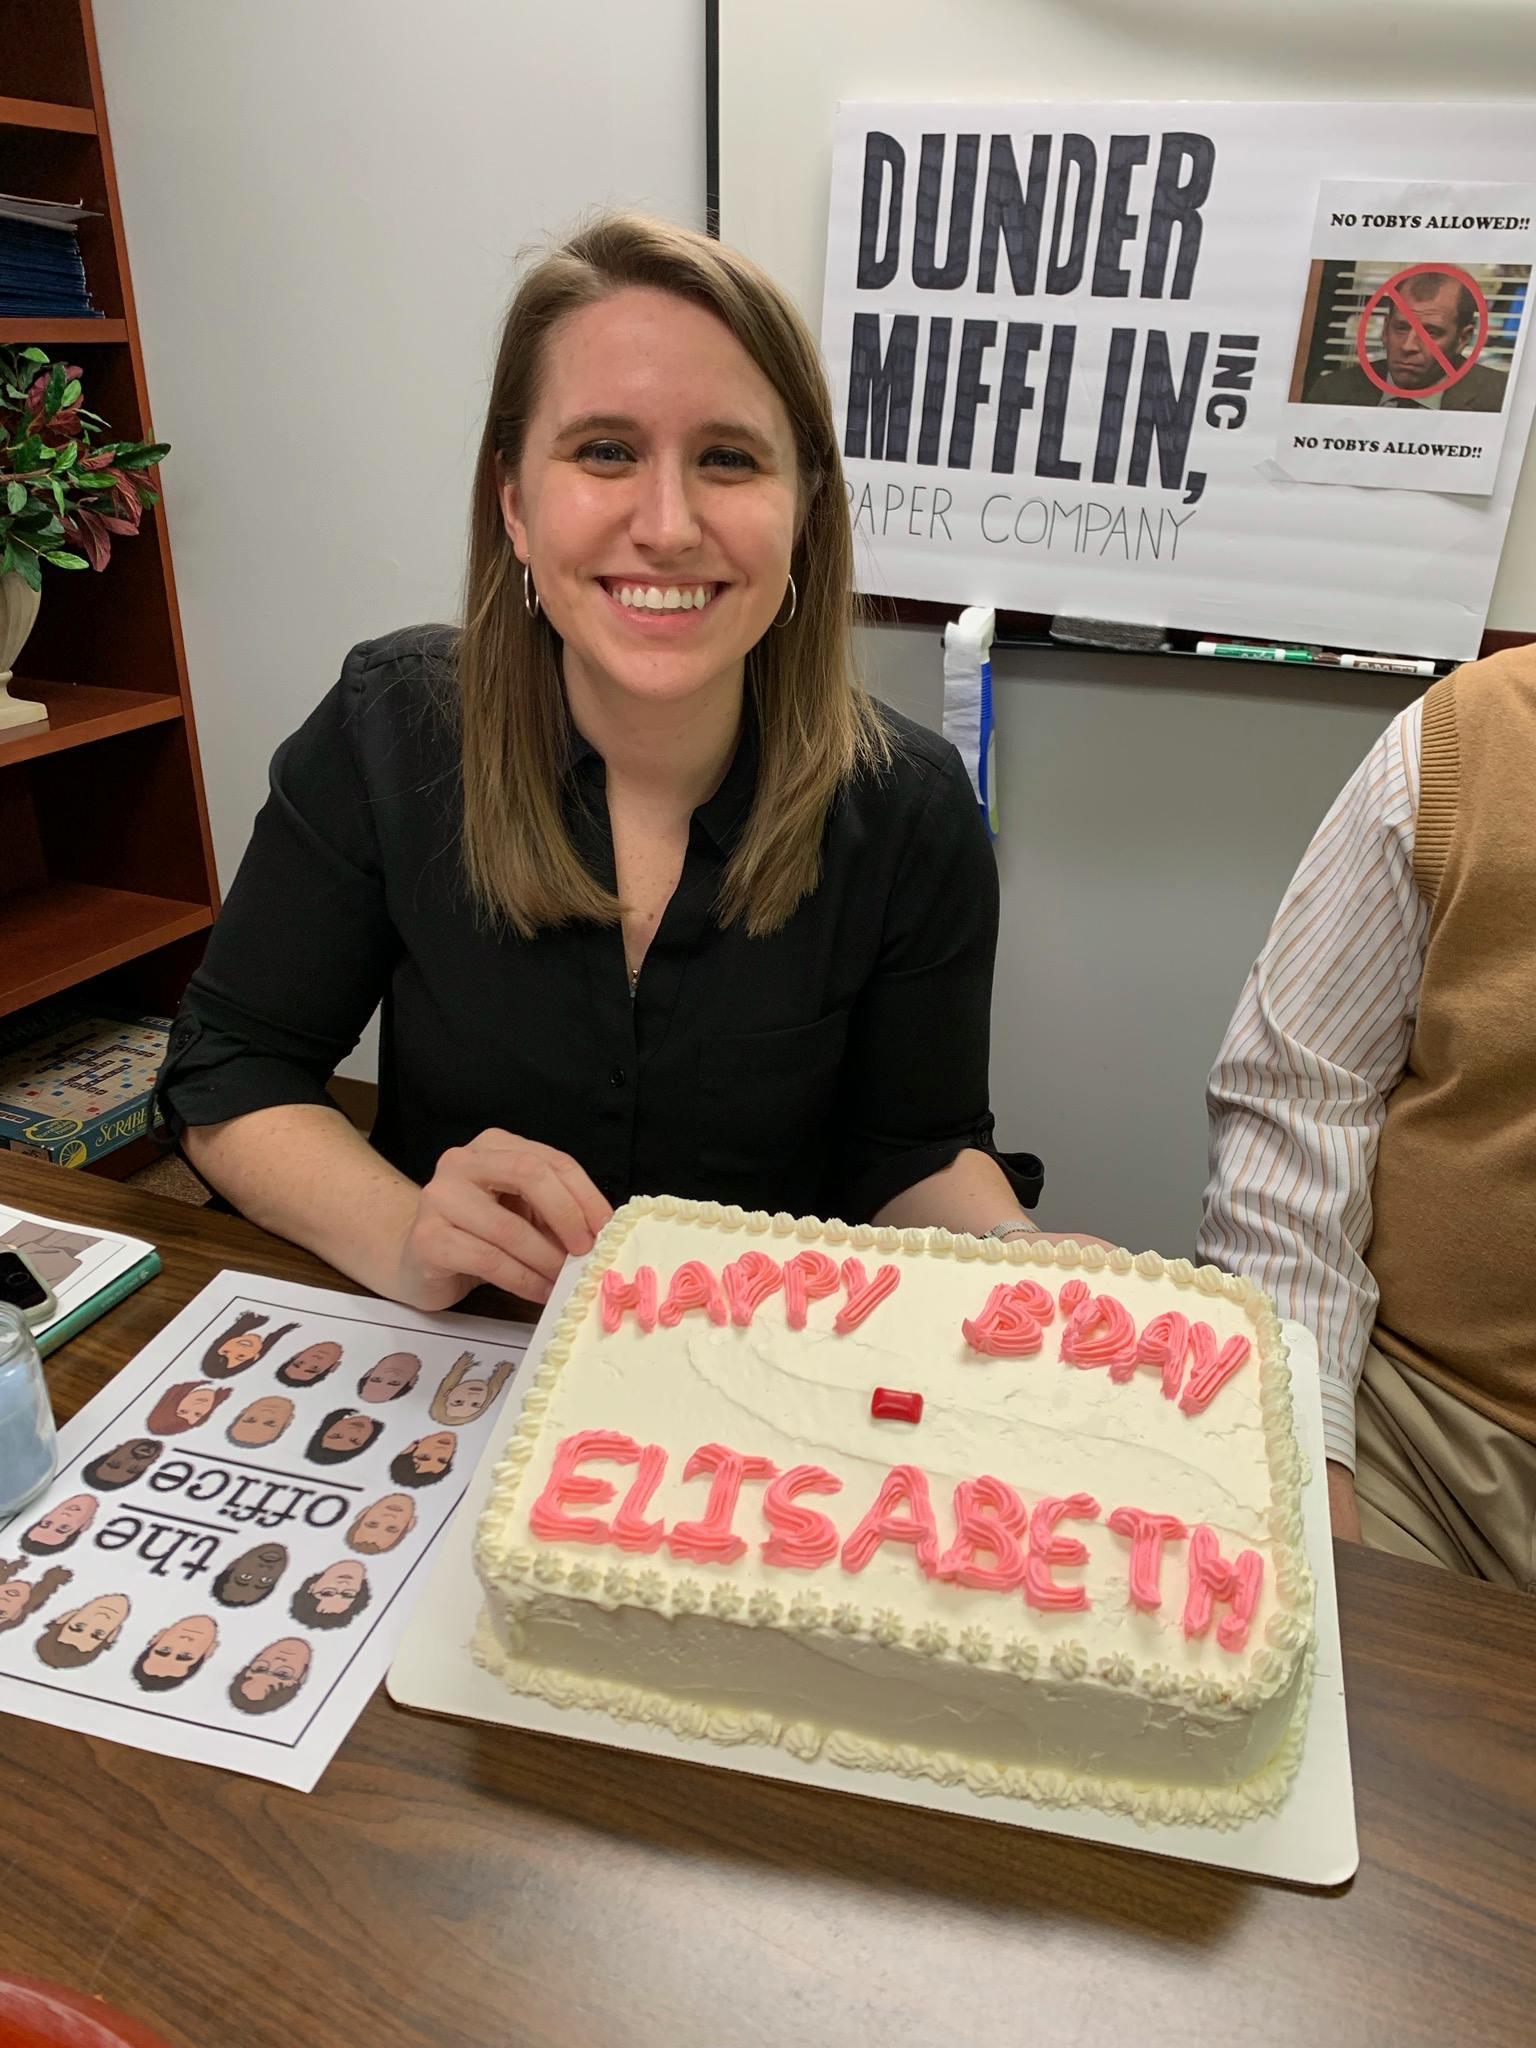 Elizabeth Birthday 2019 - The Office Theme